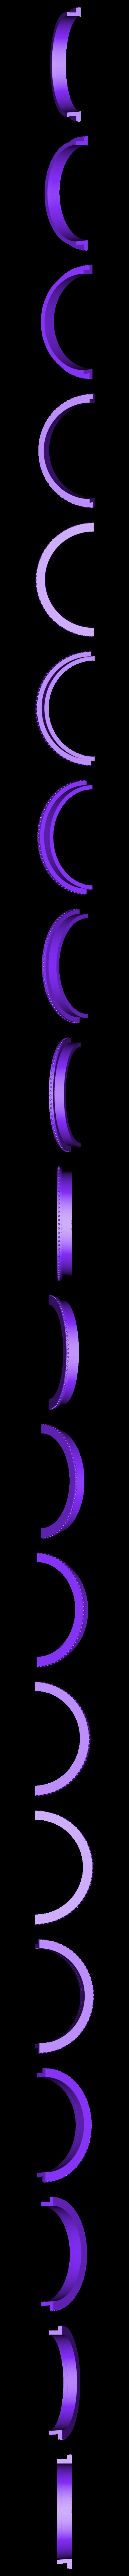 Boiler_Section_1_-_SCALED_Part_6-.STL Download free STL file 4-8-8-4 Big Boy Locomotive • 3D printer object, RaymondDeLuca